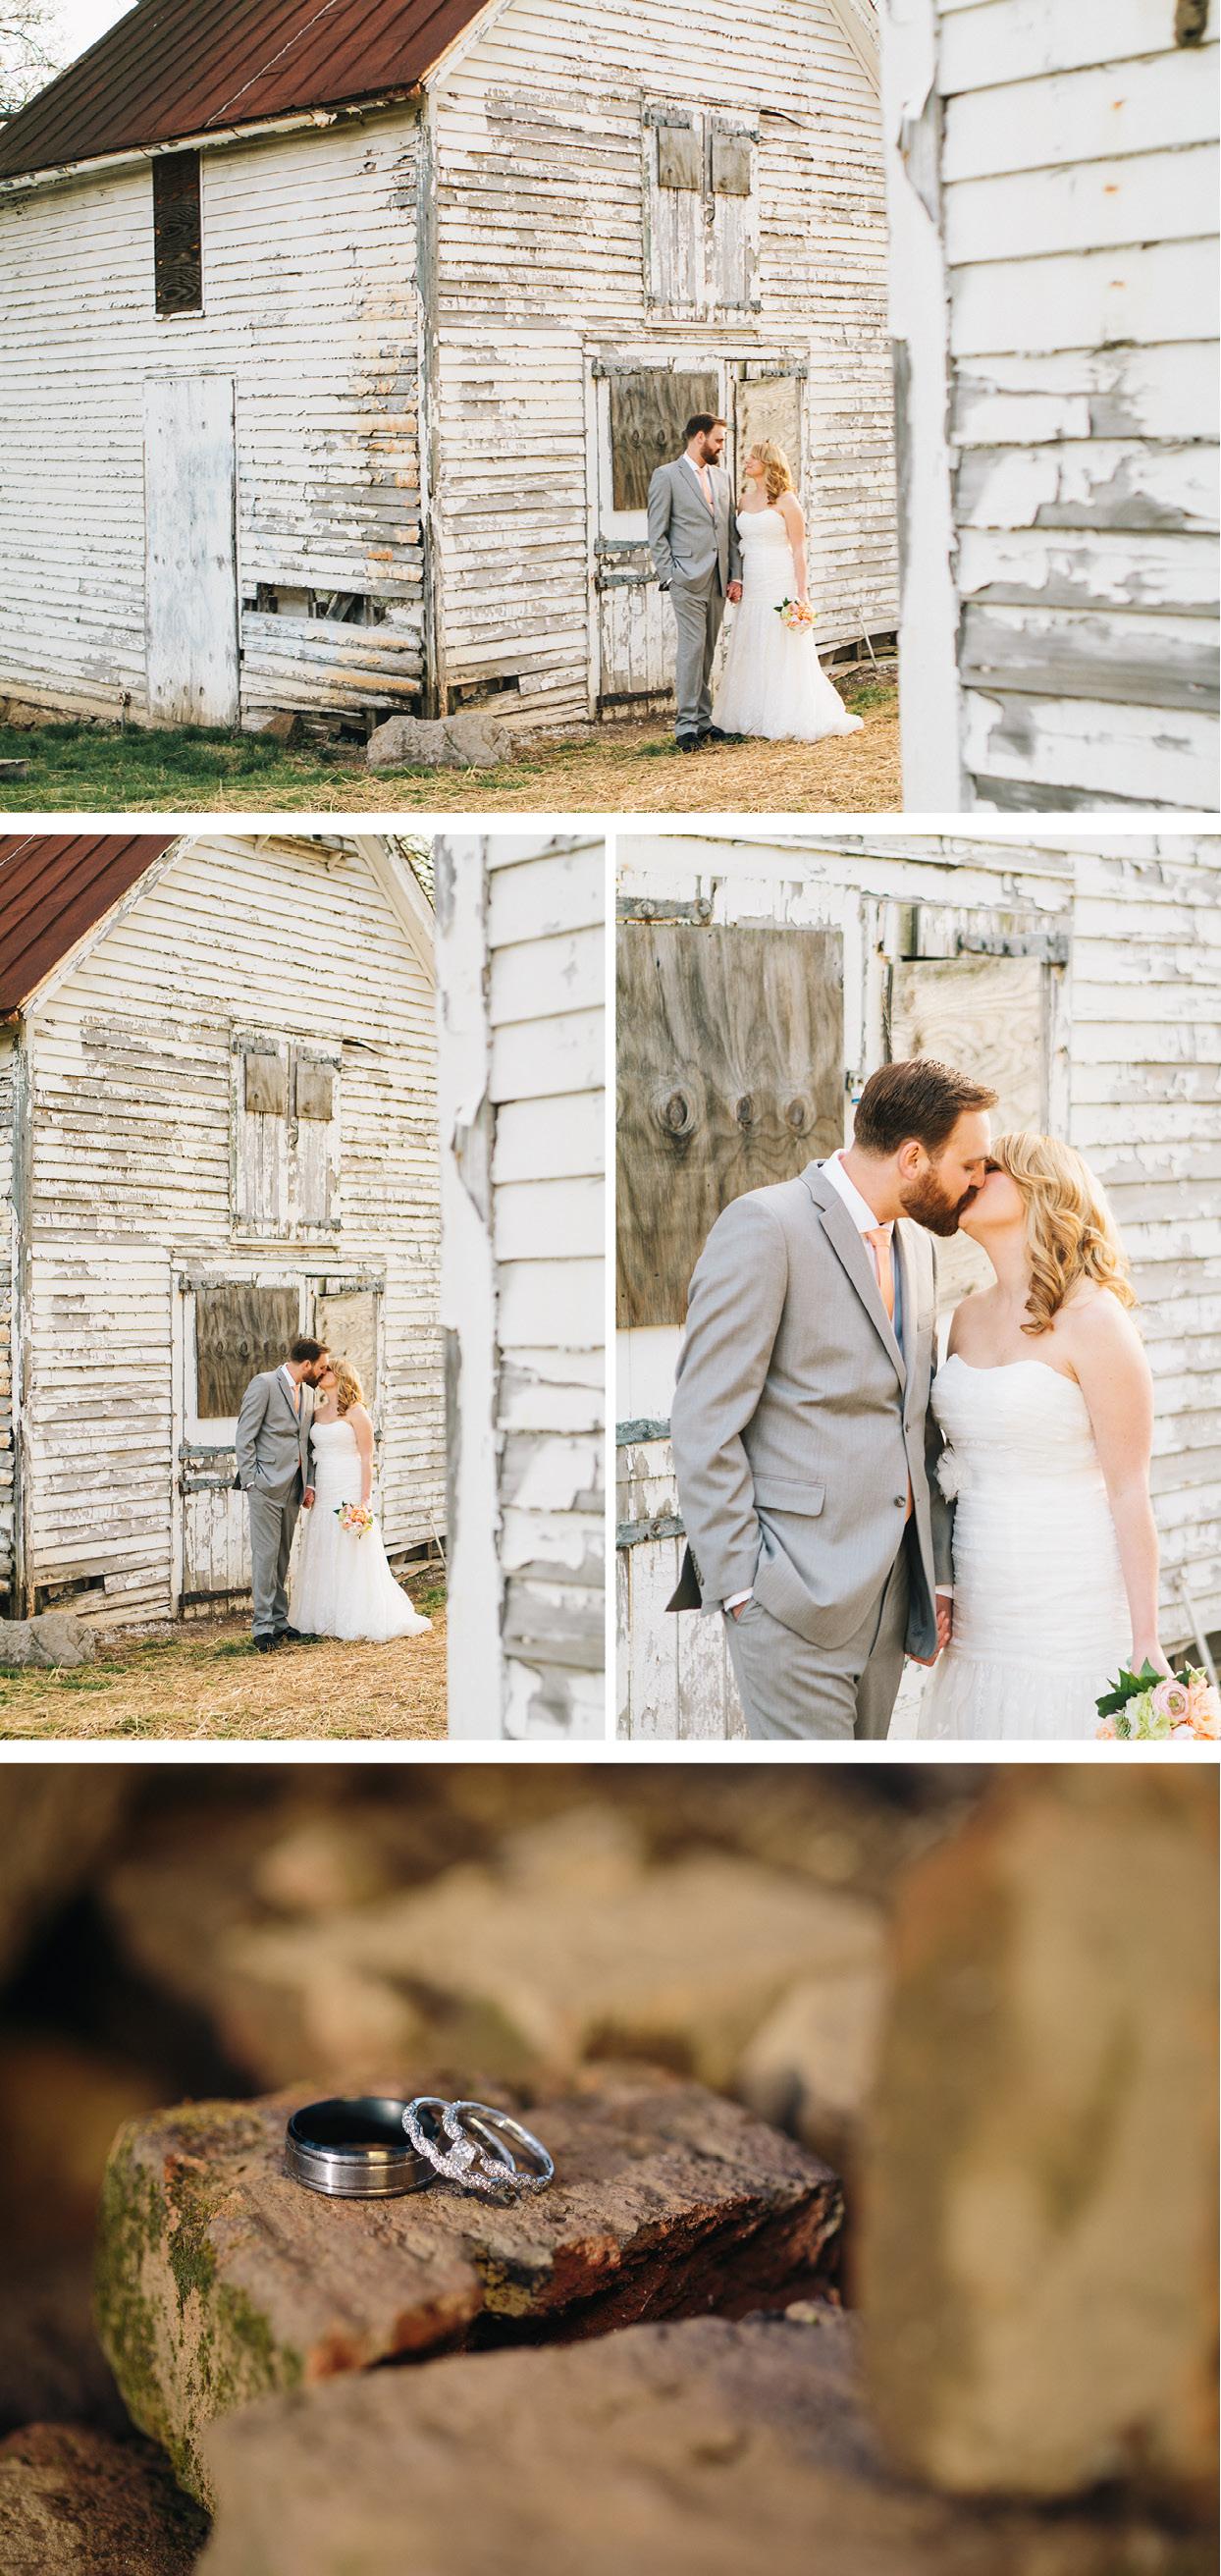 CK-Photo-Nashville-Wedding-Photographer-ST7.jpg